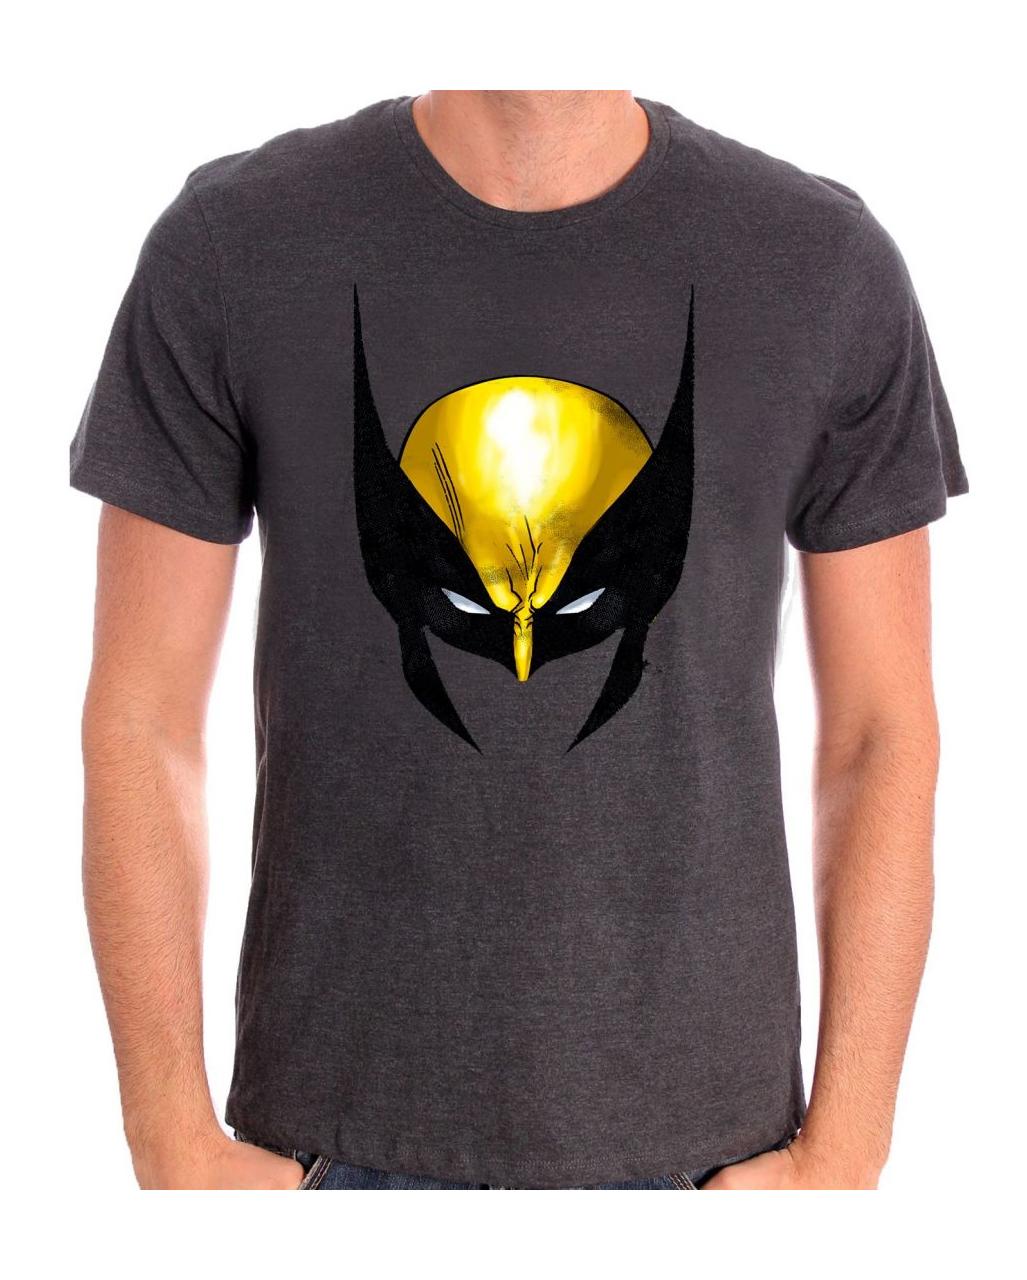 b5678f6a7 Wolverine Mask Motif T-Shirt for superheroes | horror-shop.com